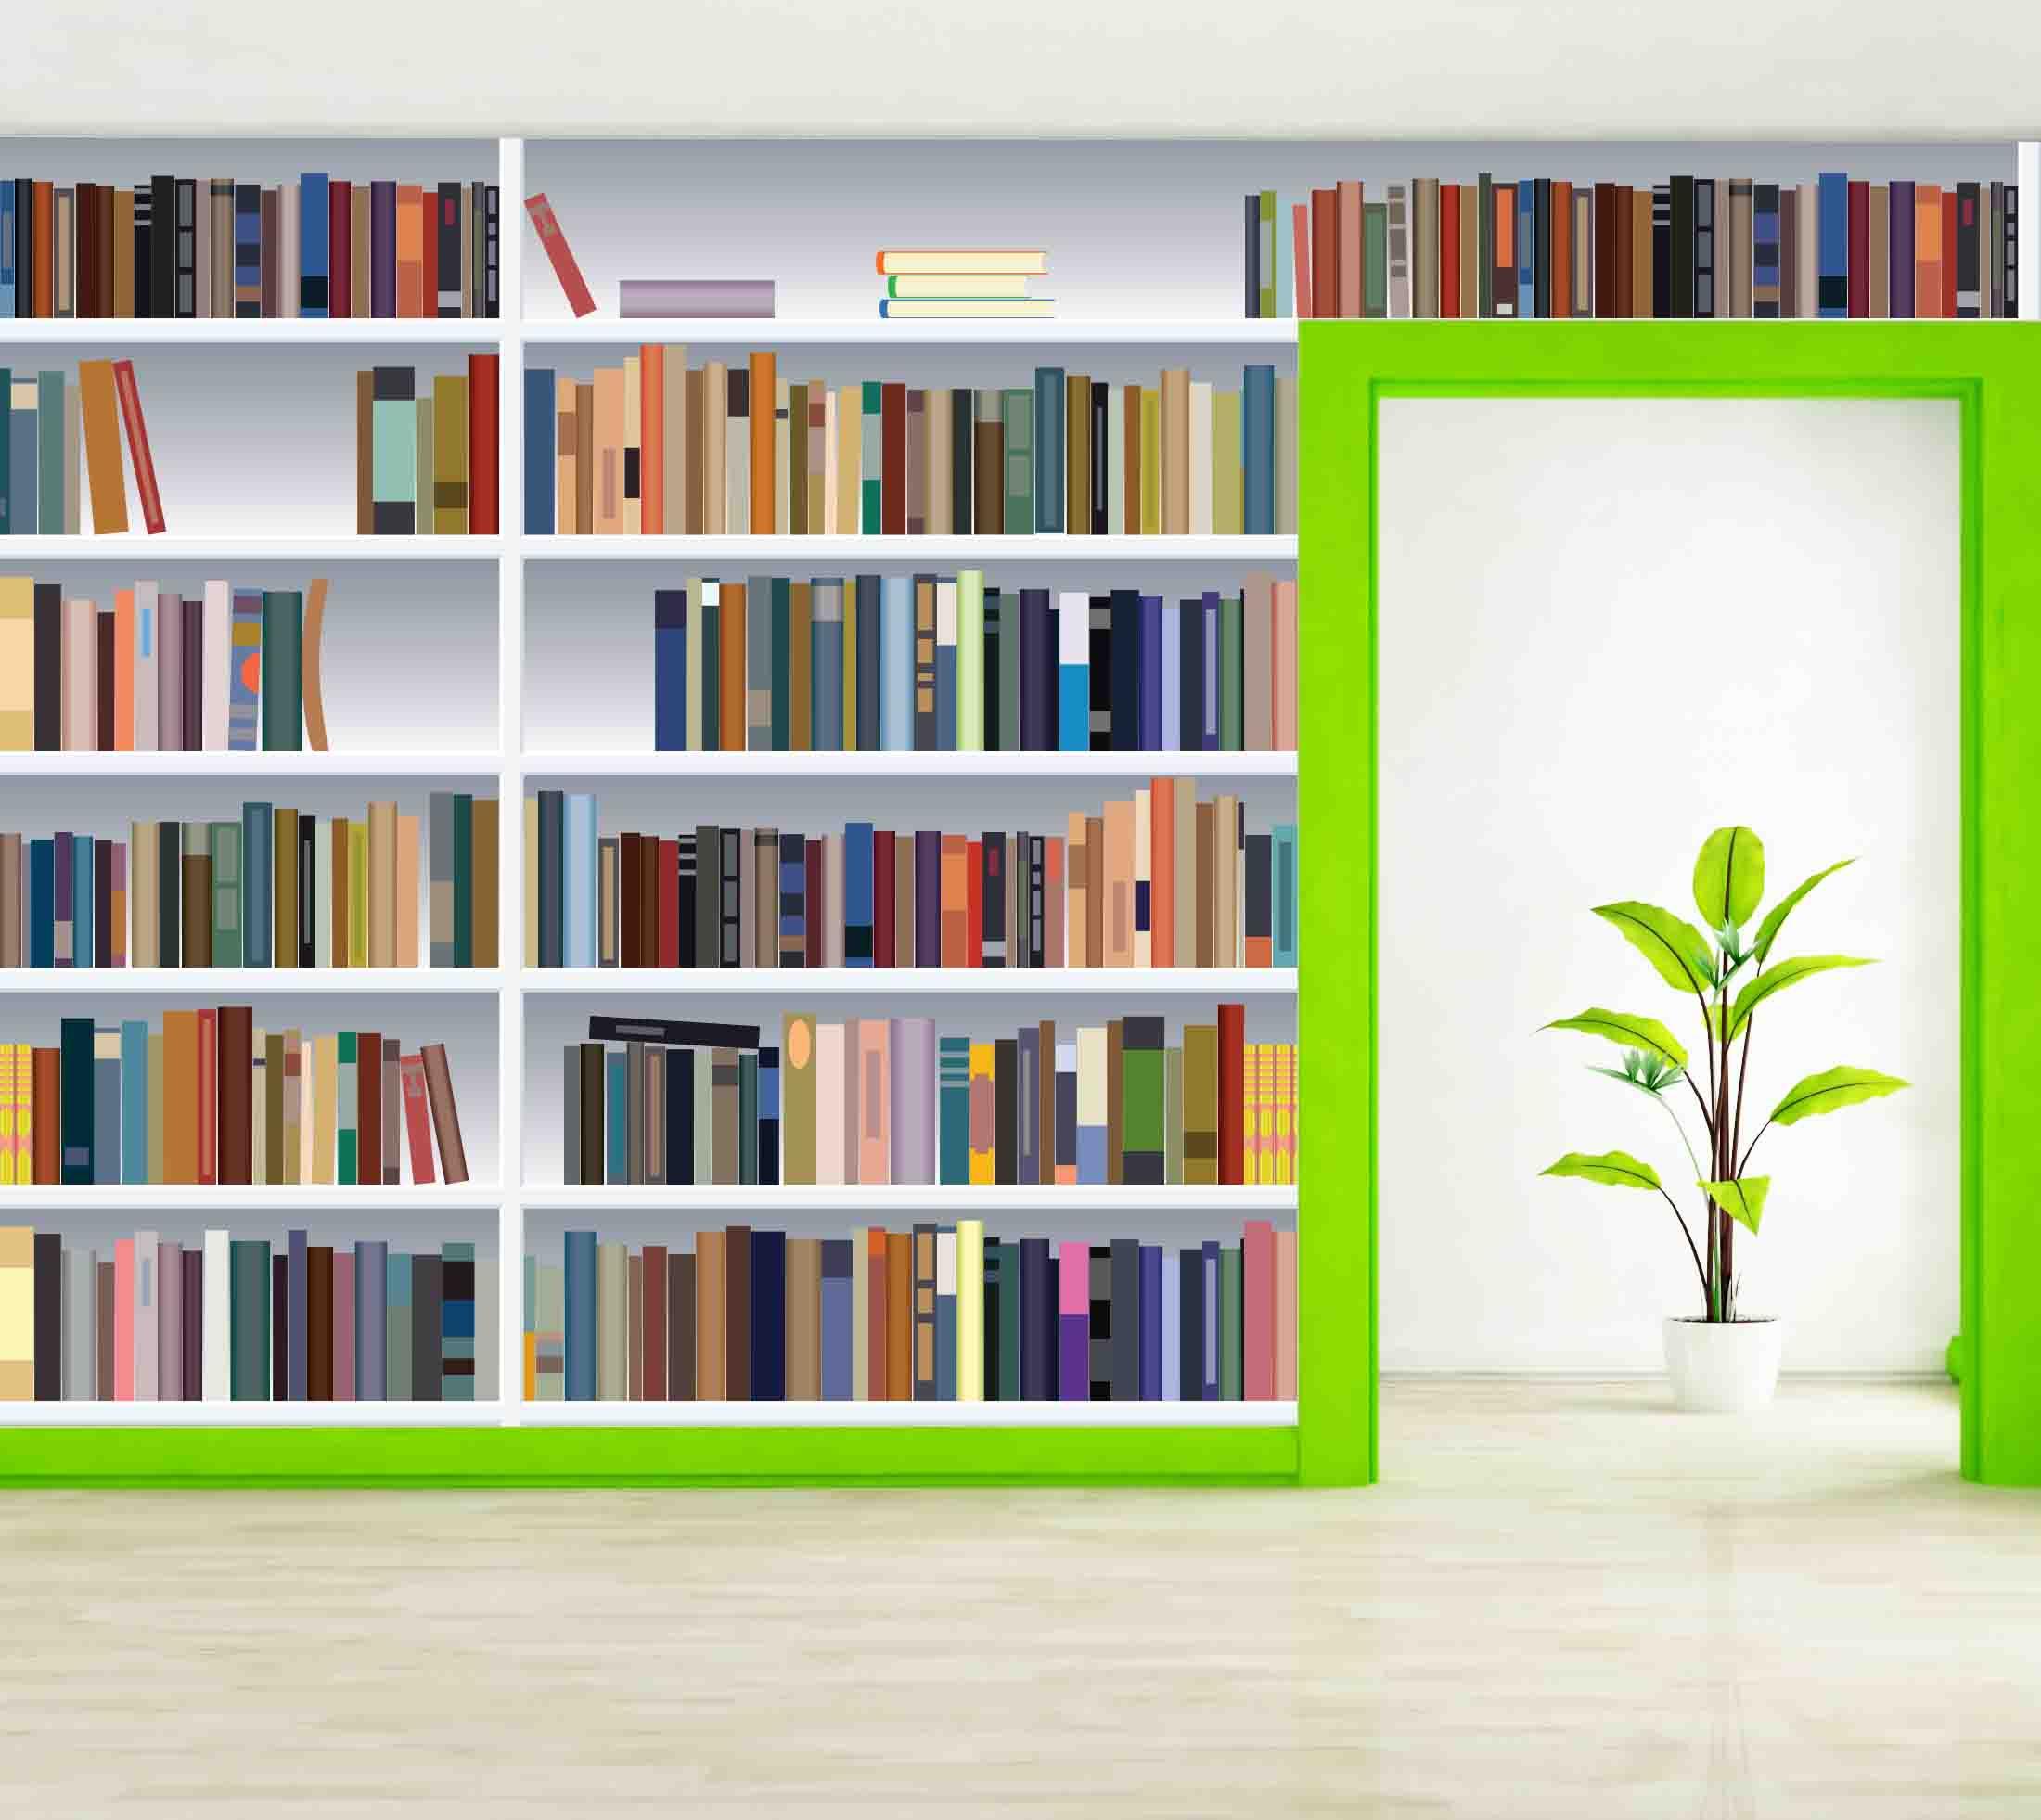 Bookshelf Wallpaper Bookshelf wallpapers 2200x1962